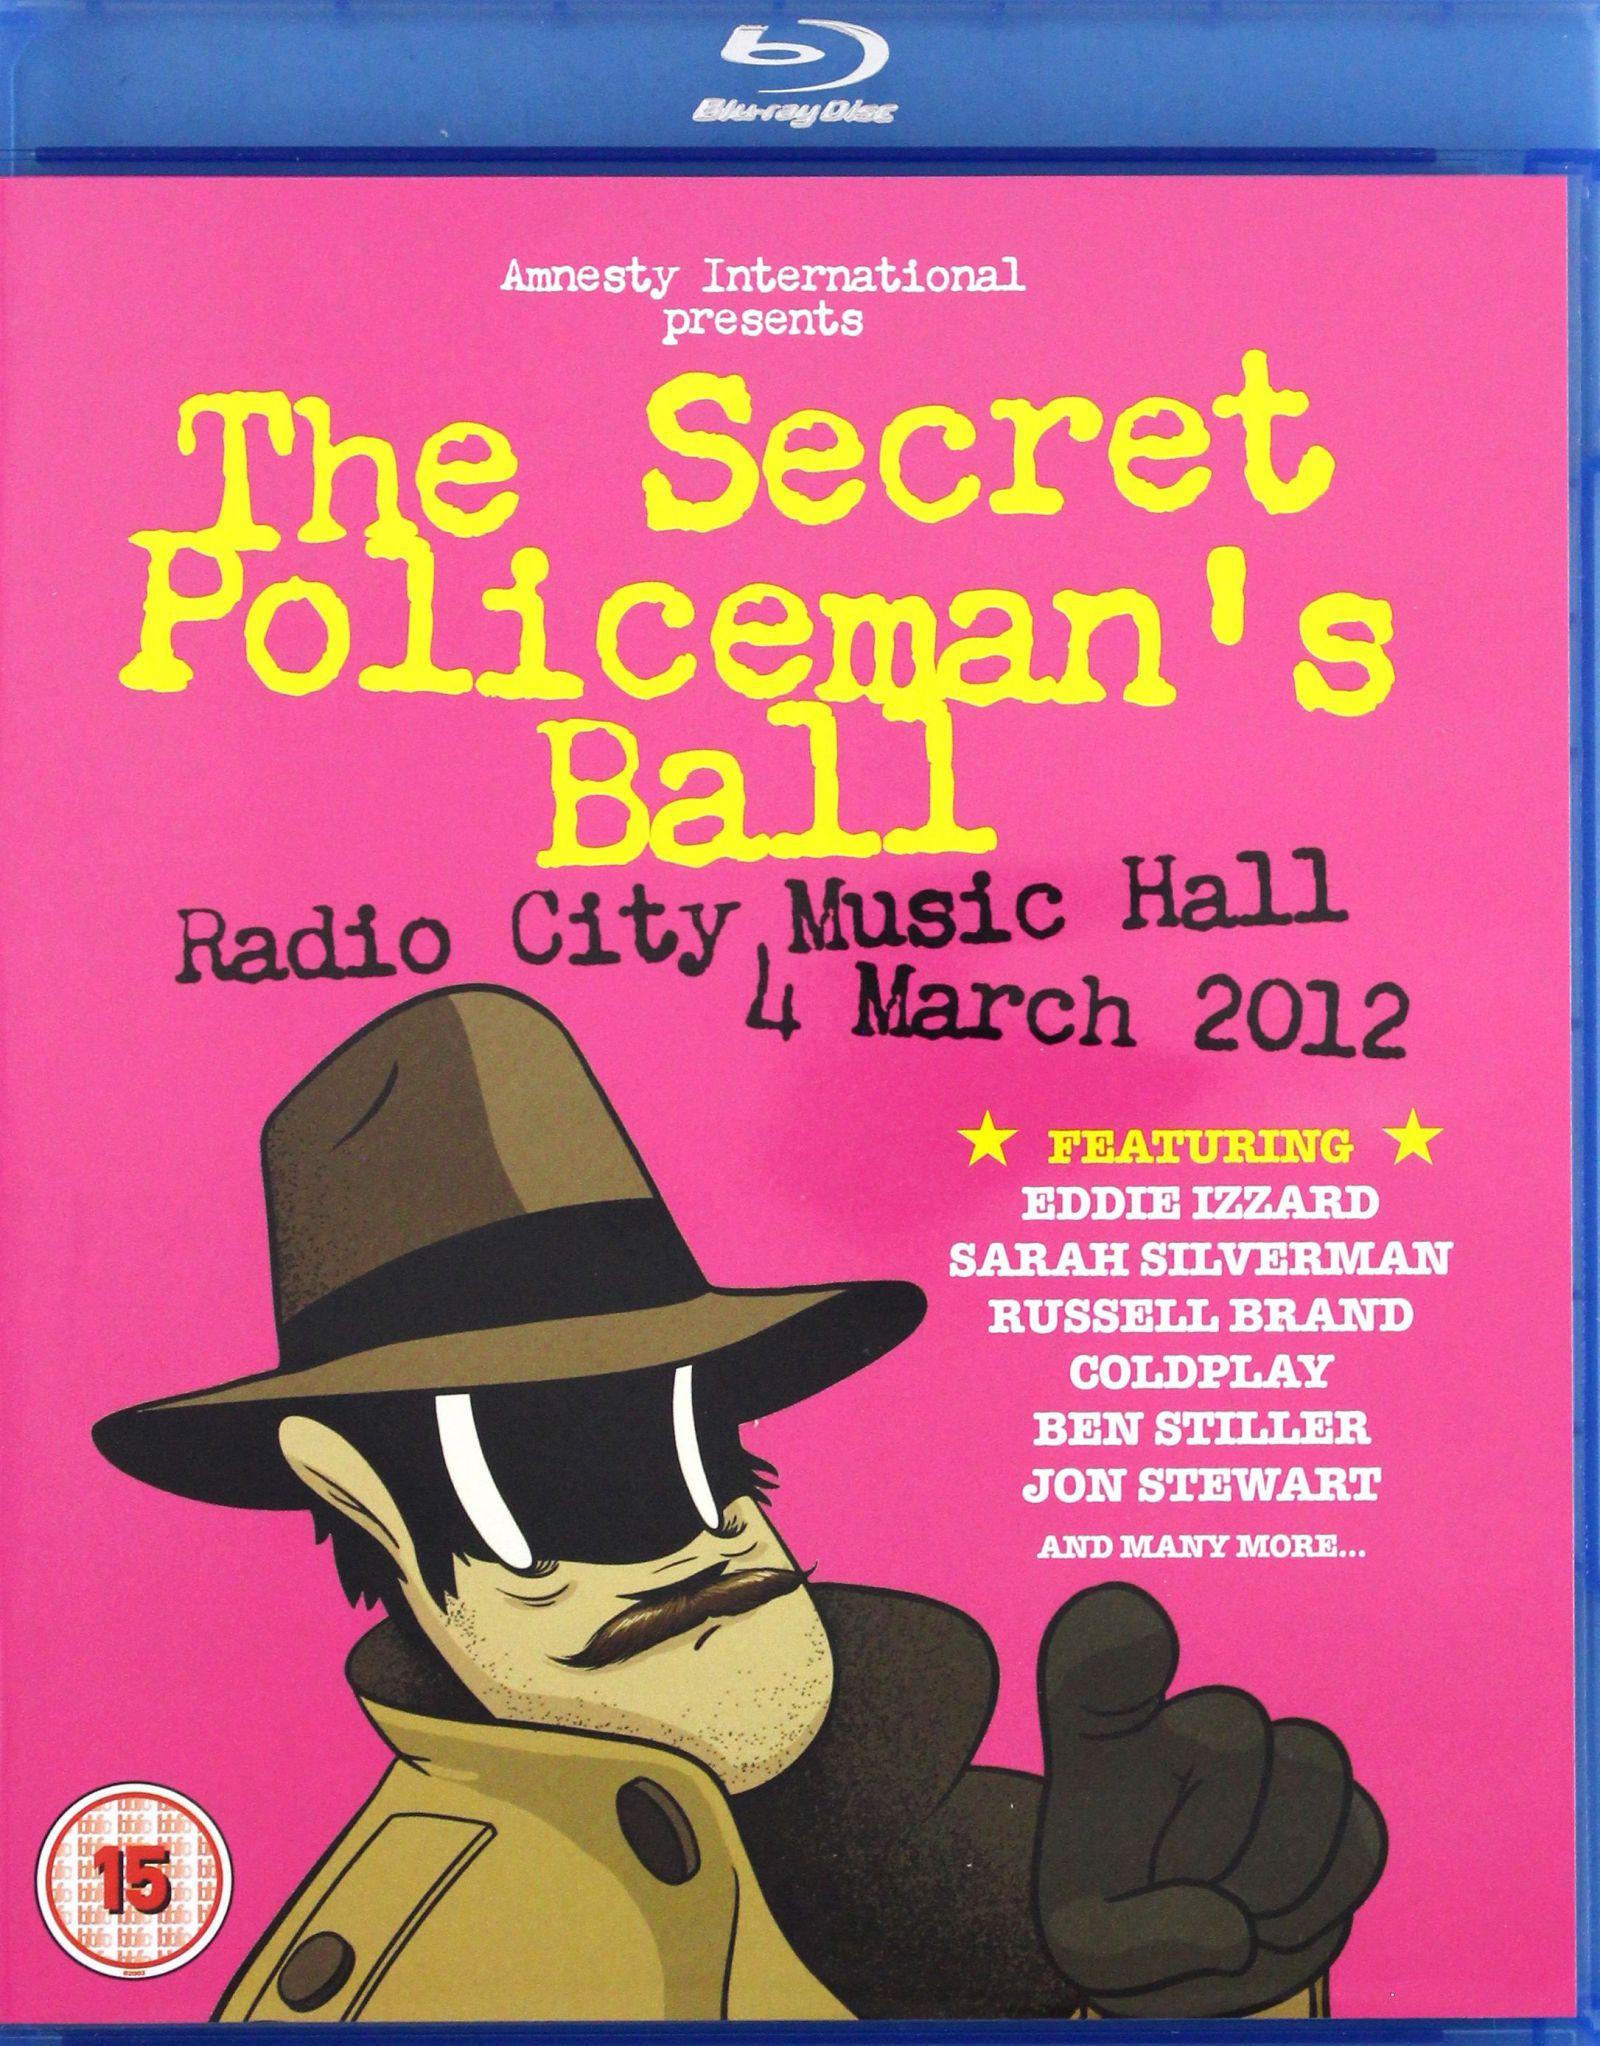 SECRET POLICEMANS BALL - RADIO CITY MUSIC HALL 4 M